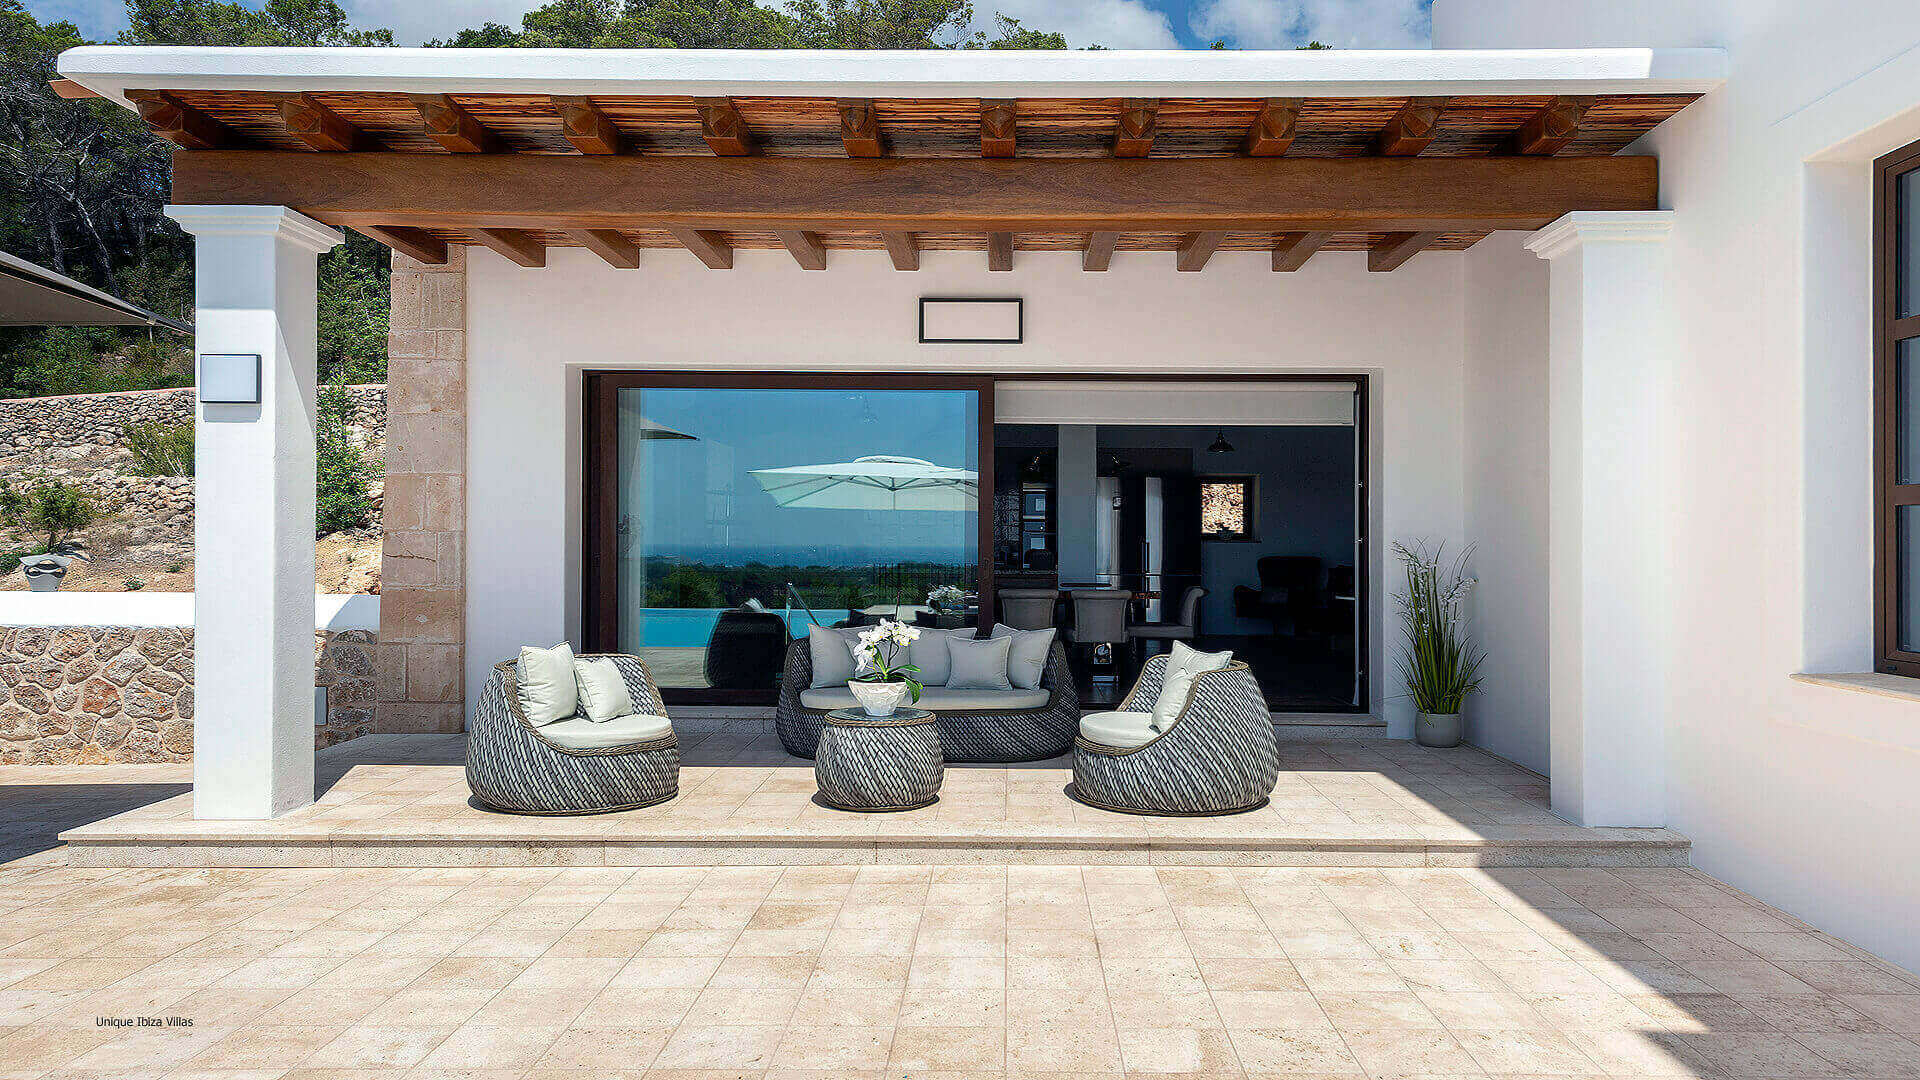 Casa Prats Ibiza 16 Santa Eulalia